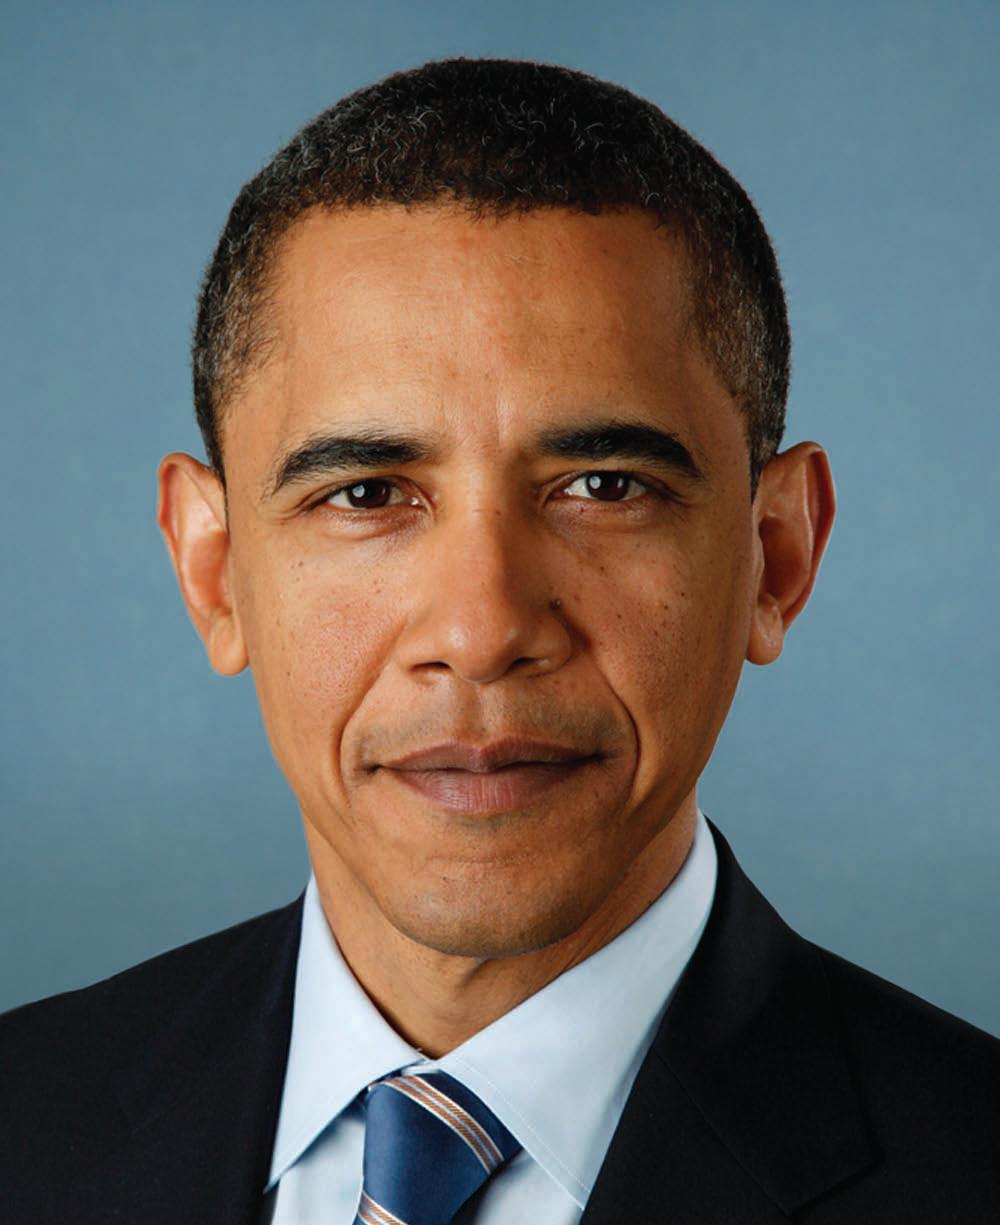 Portrait Barack Obama Face 1000x1225 Download Hd Wallpaper Wallpapertip